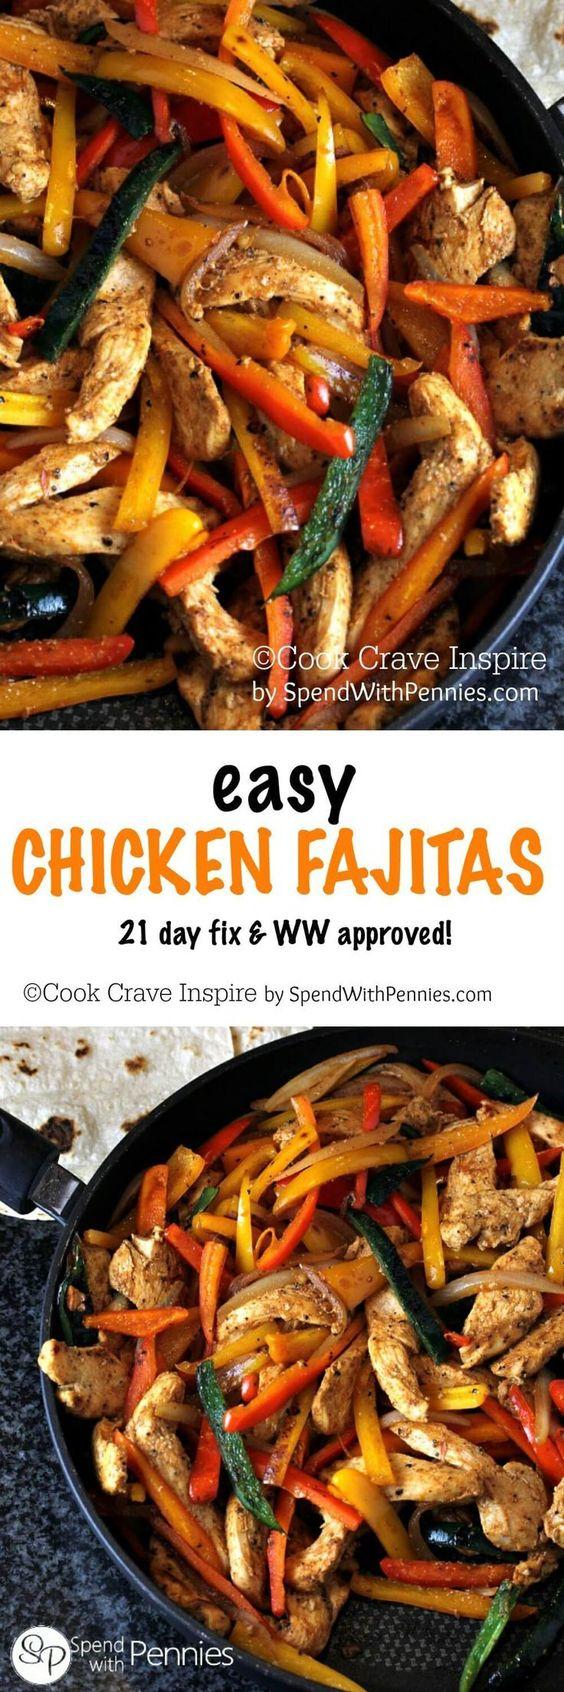 Easy chicken fajitas, Chicken fajitas and Chicken on Pinterest